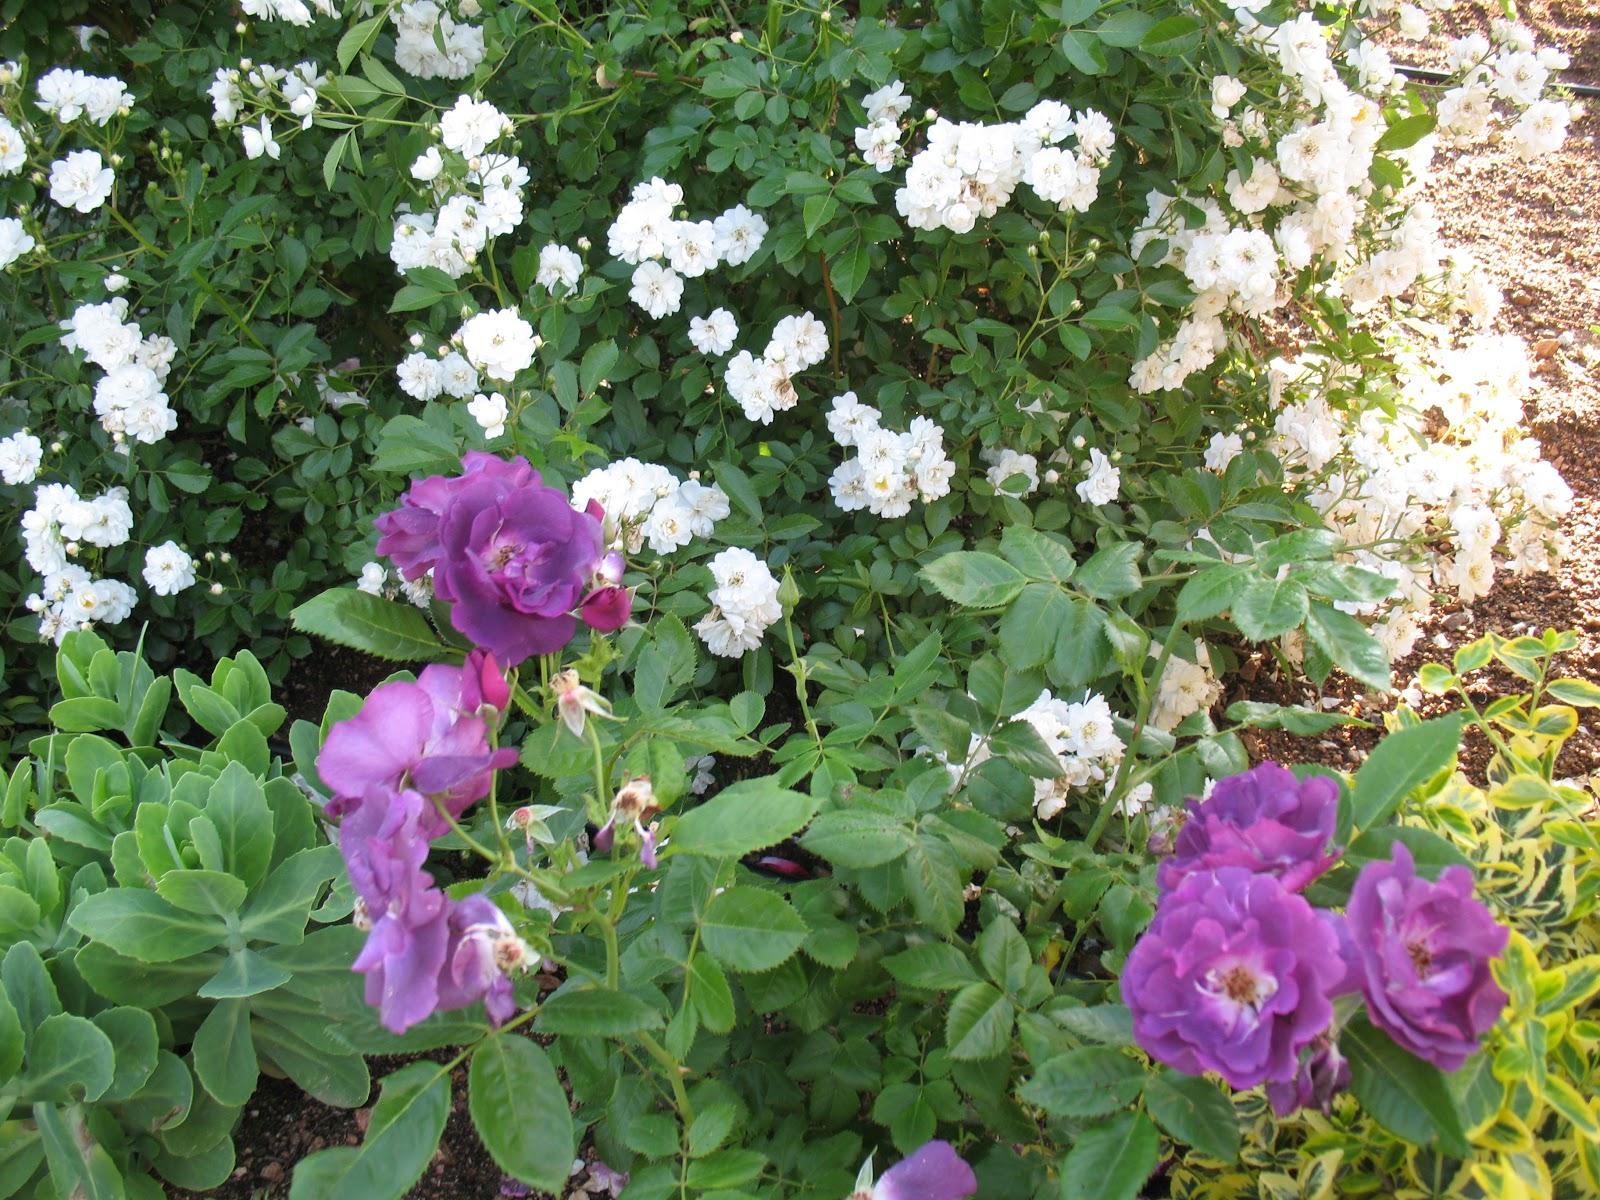 roses du jardin ch neland rosier rhapsody in blue. Black Bedroom Furniture Sets. Home Design Ideas